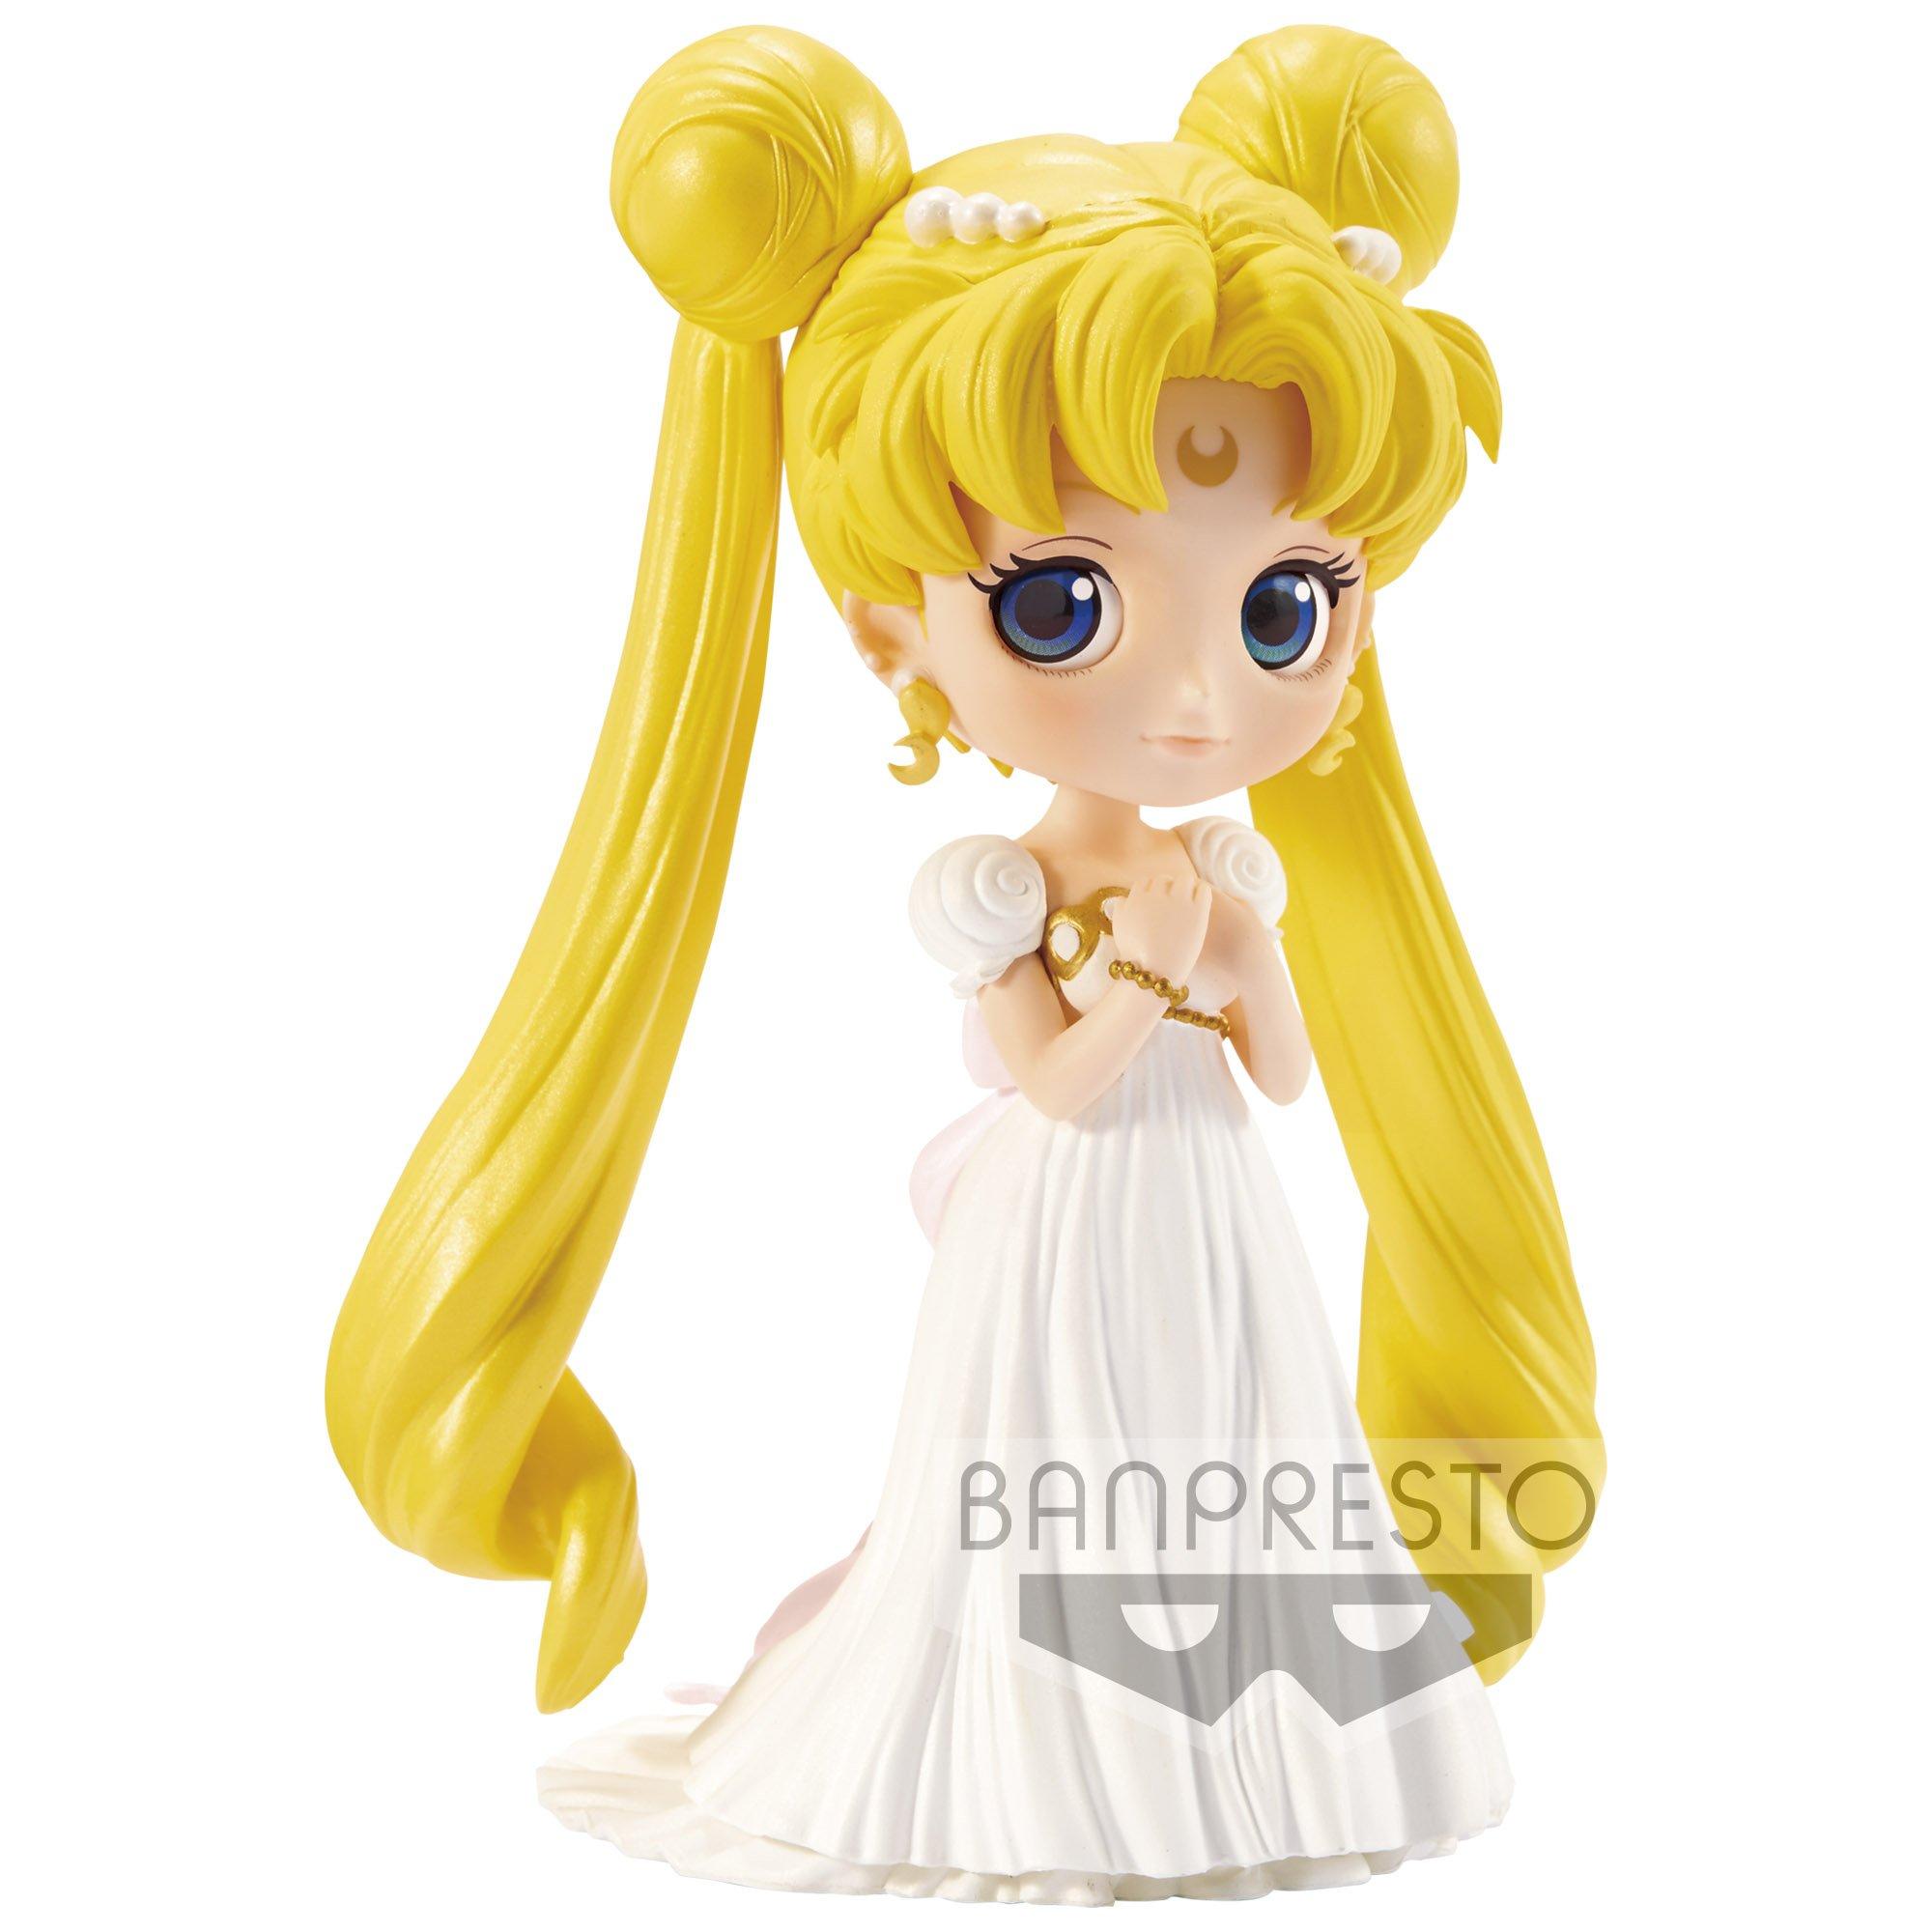 Sailor Moon - Q Posket : Figurine Princess Serenity